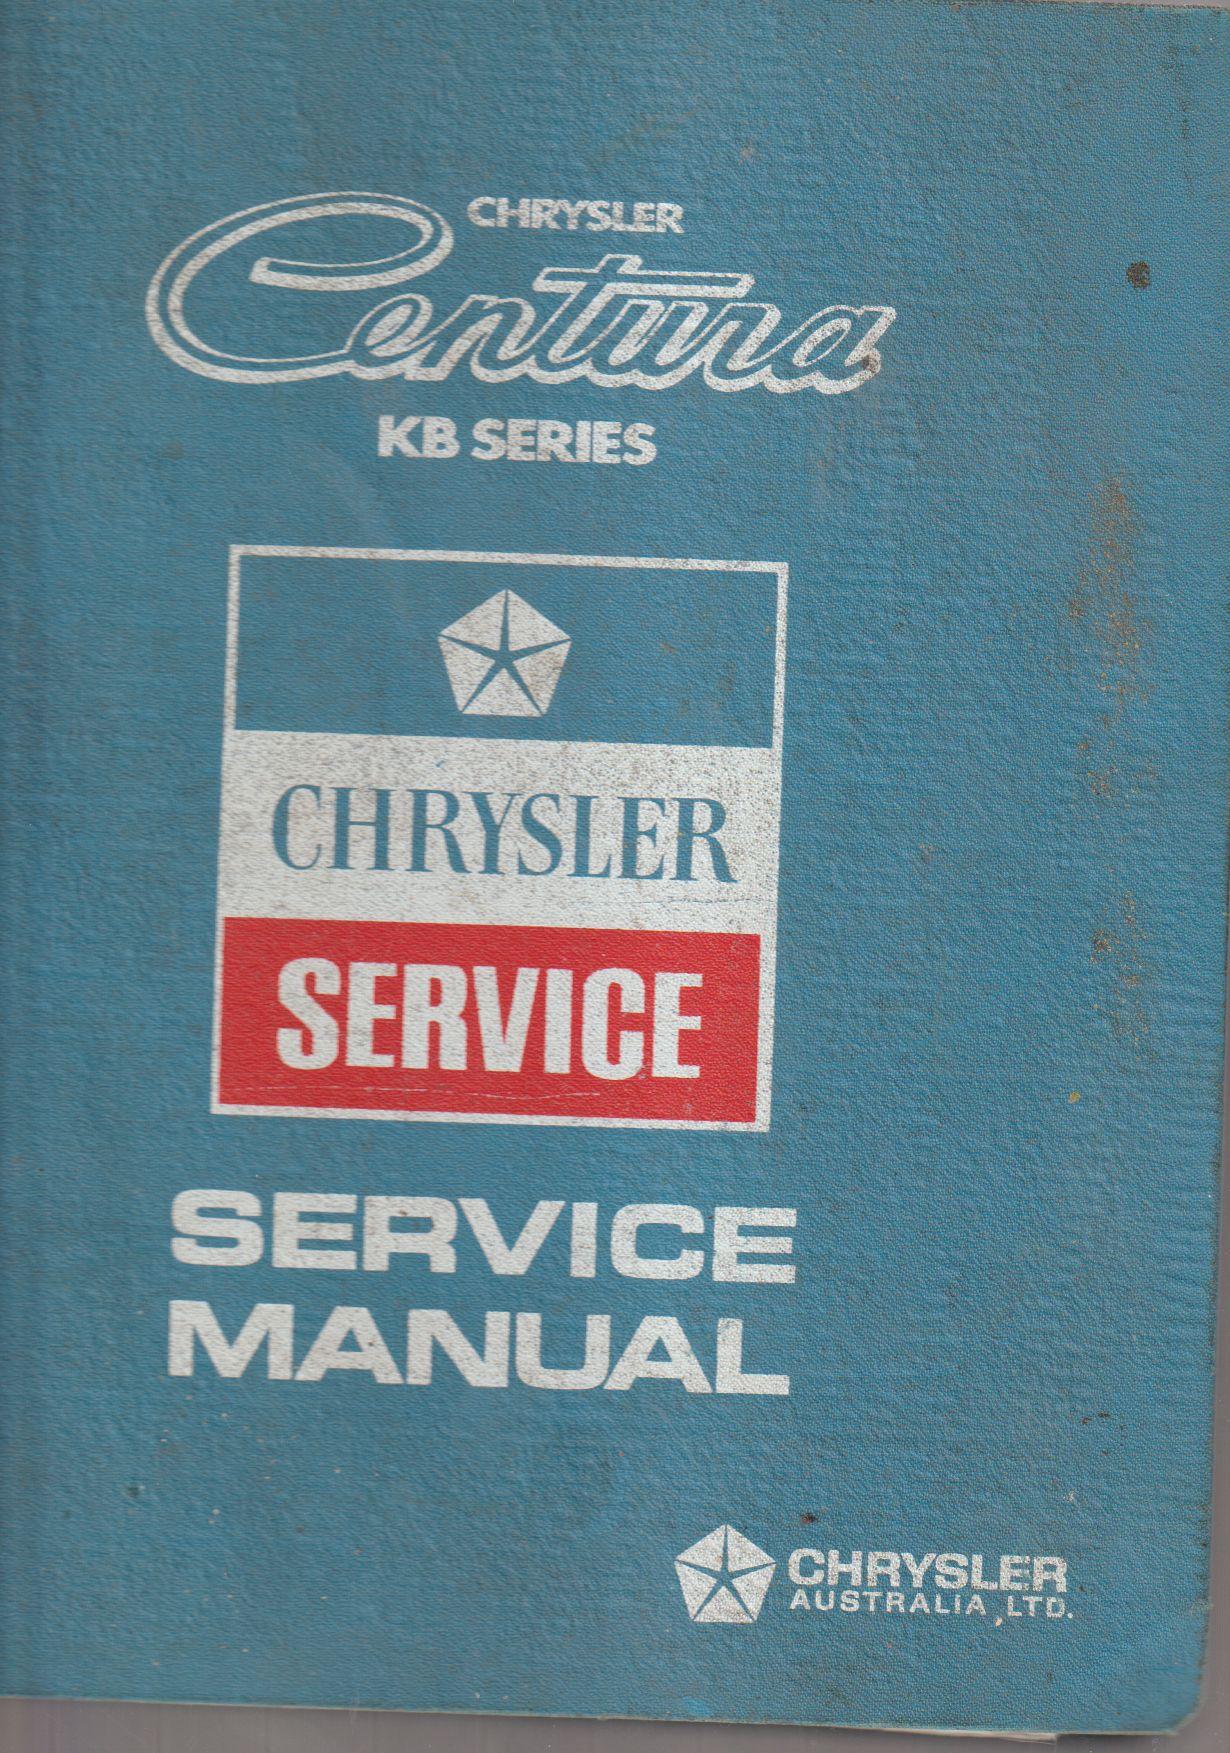 Chrysler Centura KB Series Service Manual 3884930